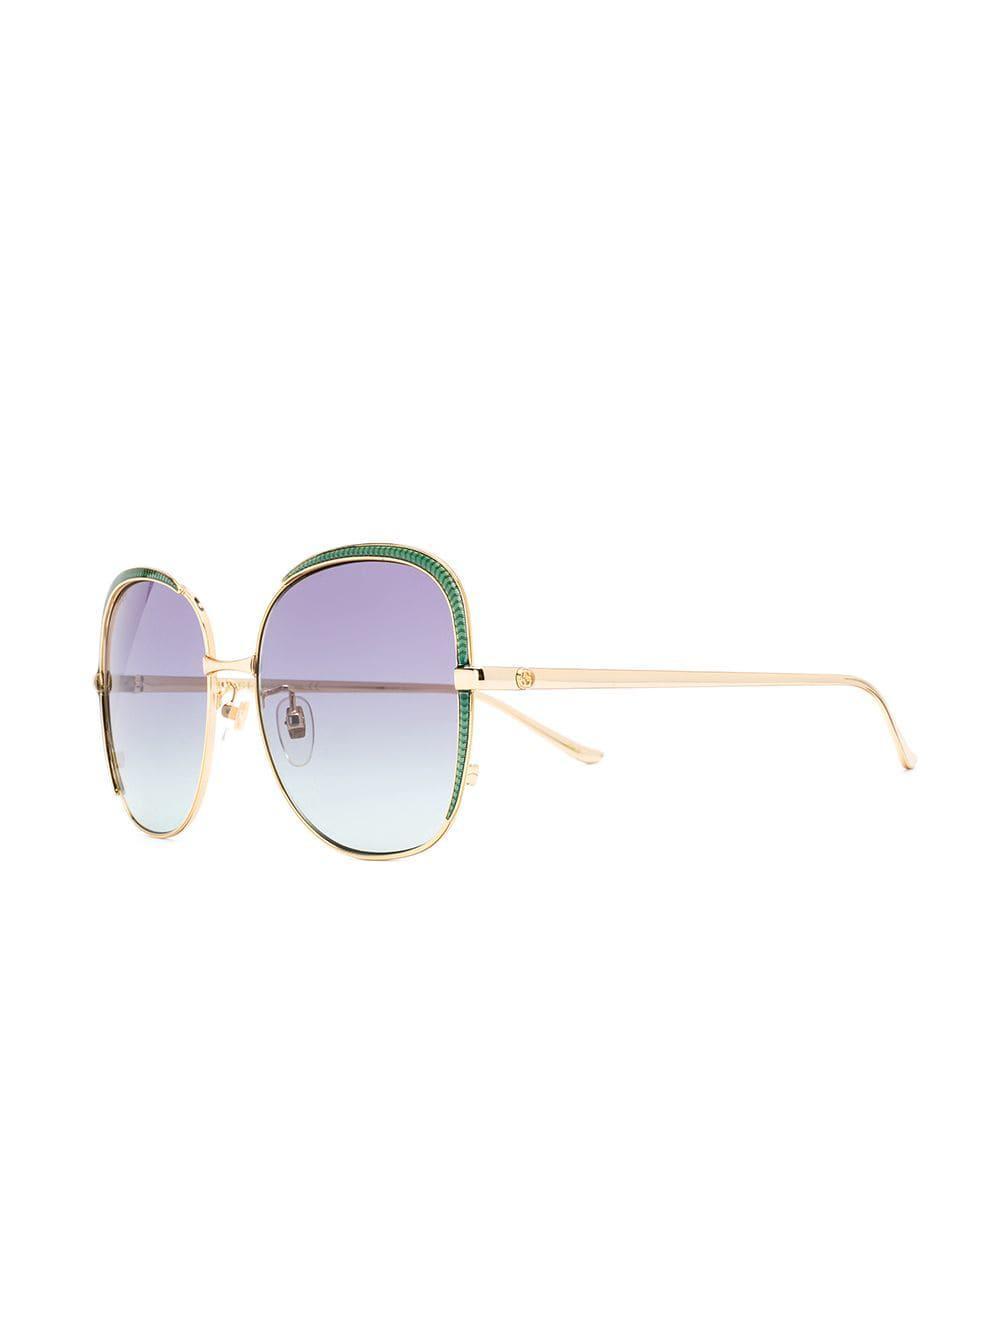 fdf63867097 Gucci - Metallic Oversized Frame Sunglasses - Lyst. View fullscreen